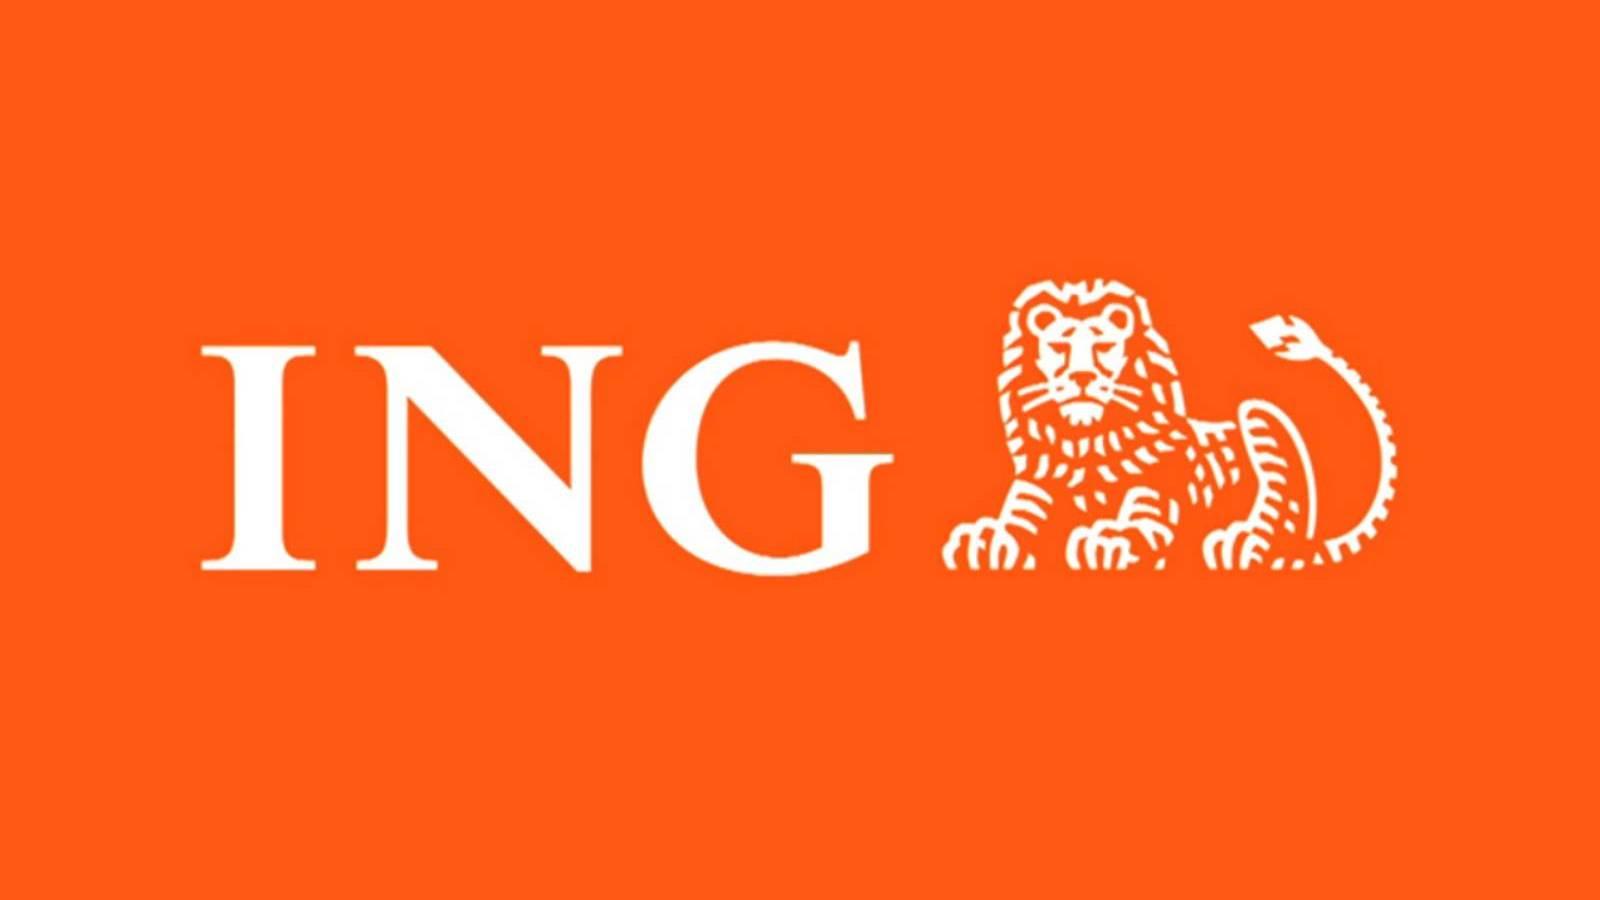 ING Bank optimizari